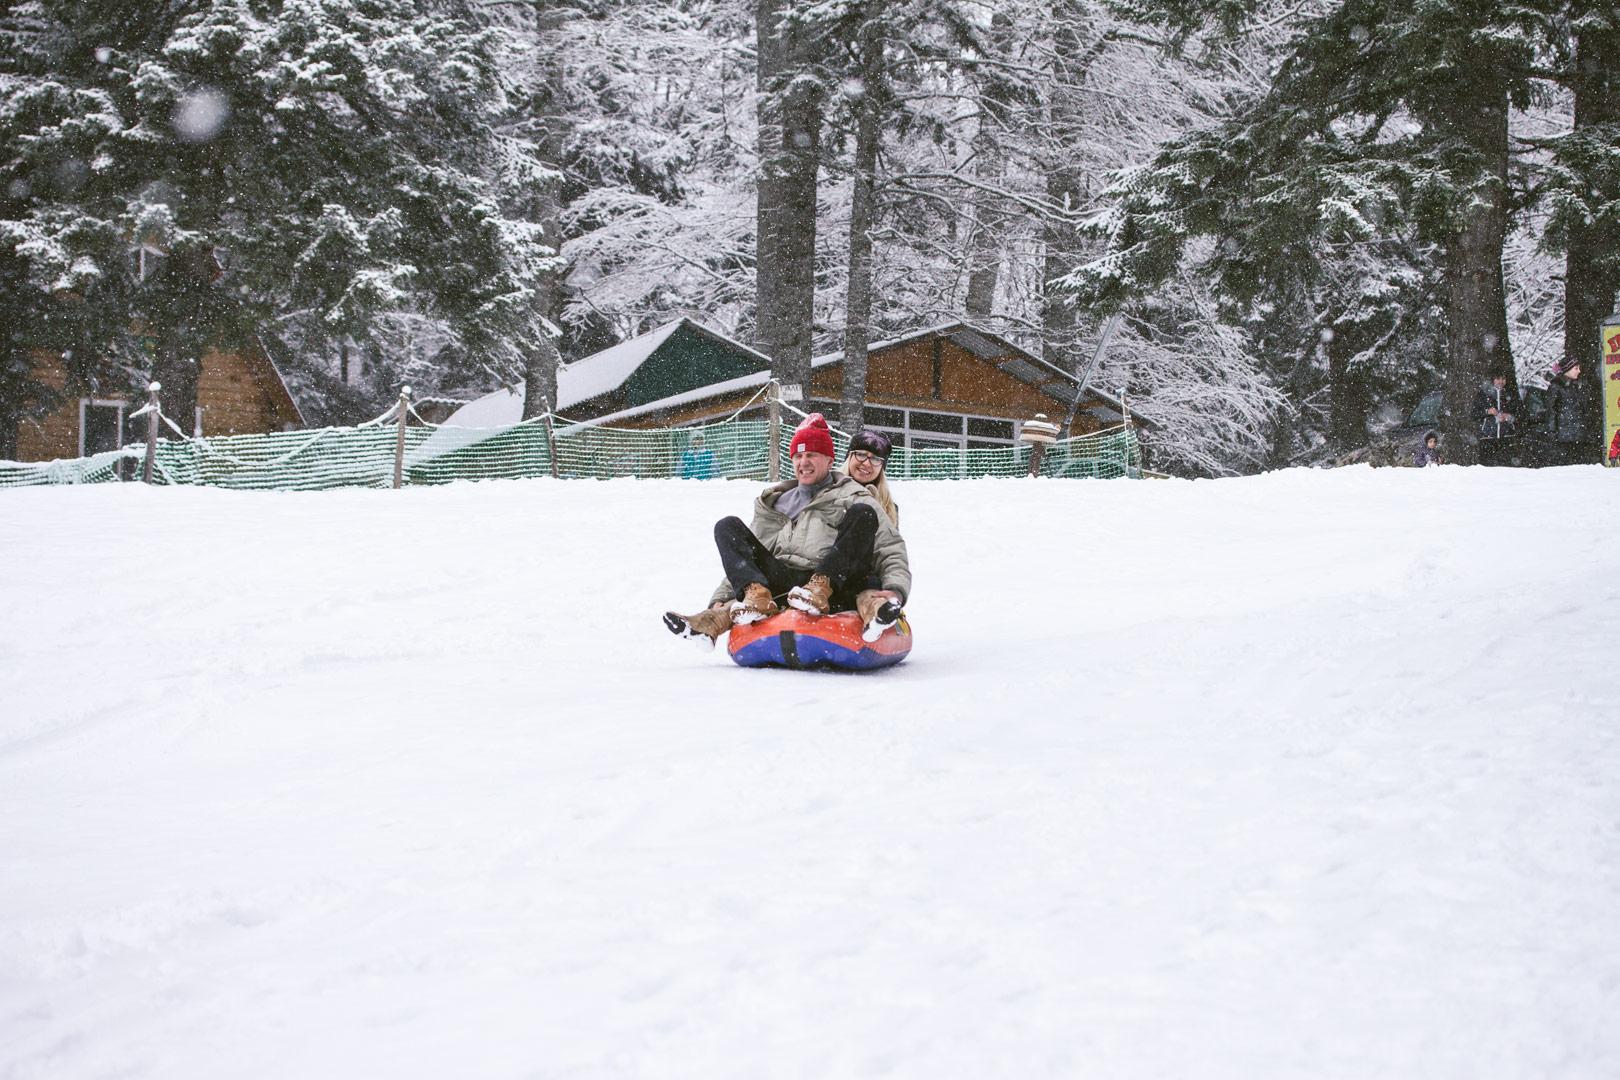 Горка для спуска на санях